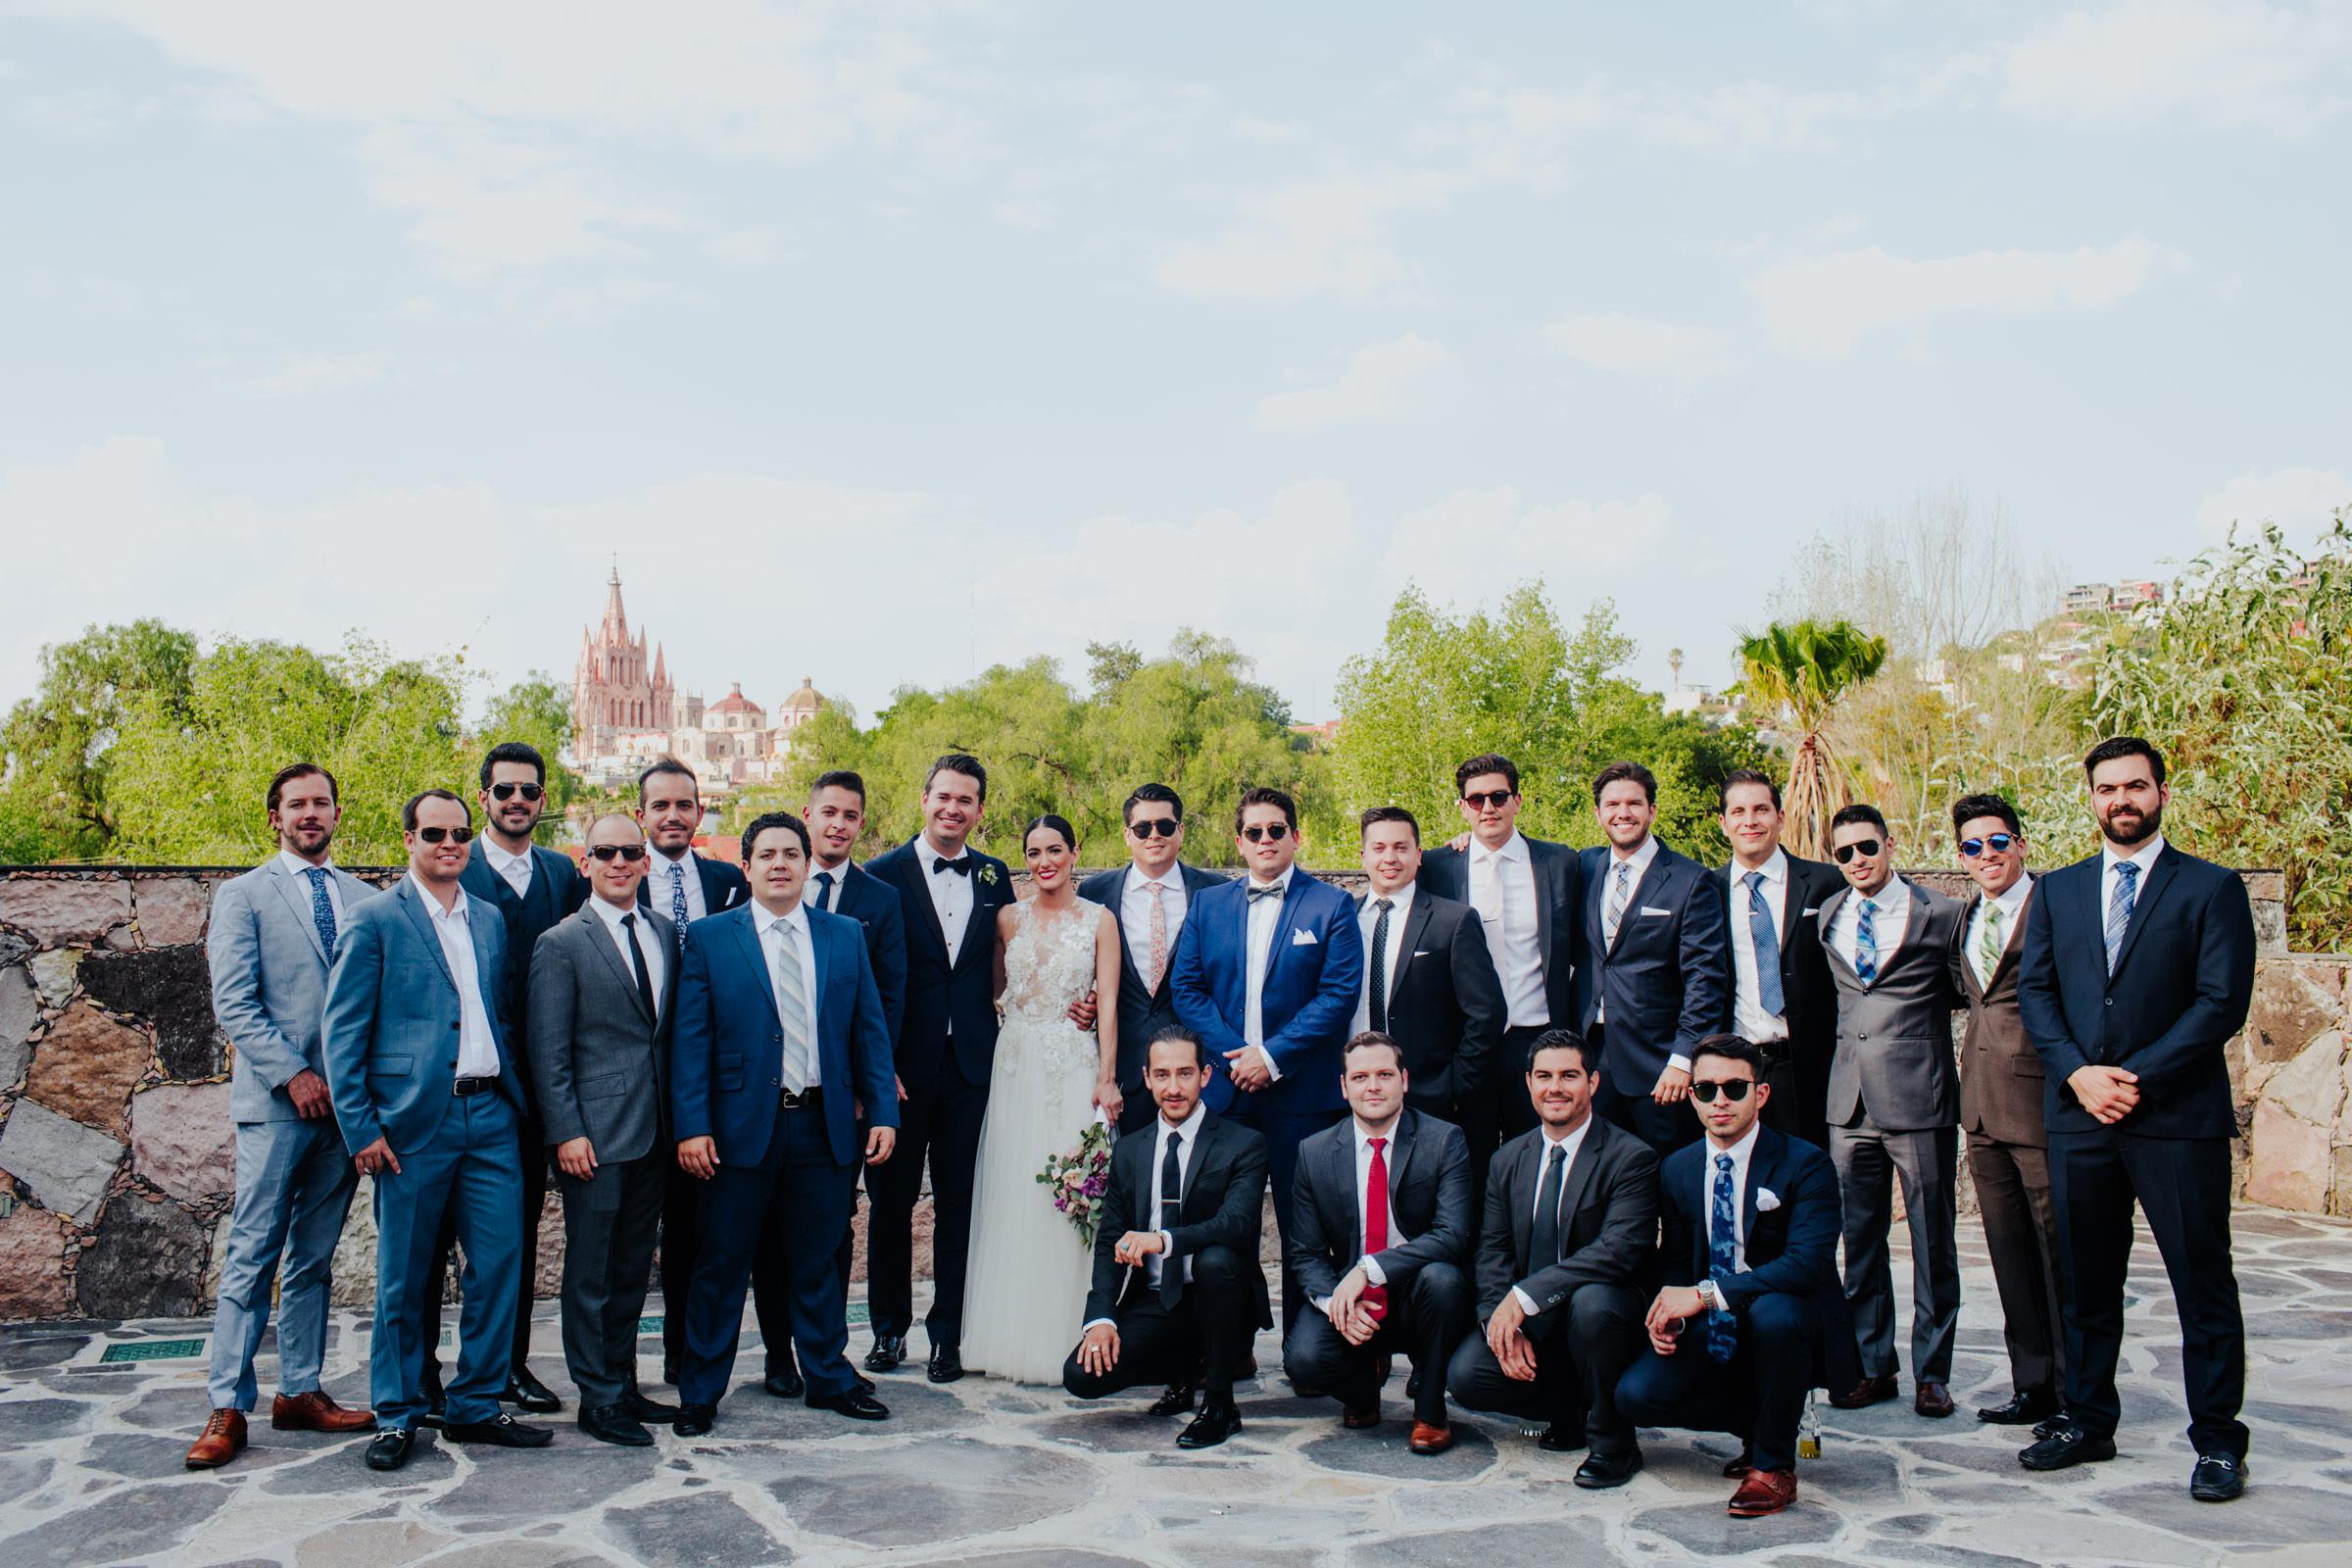 San-Miguel-de-Allende-Wedding-Photography-Parroquia-Instituto-Boda-Fotografia-Fer-Sergio-Pierce-Lifestyle-Photography0184.JPG